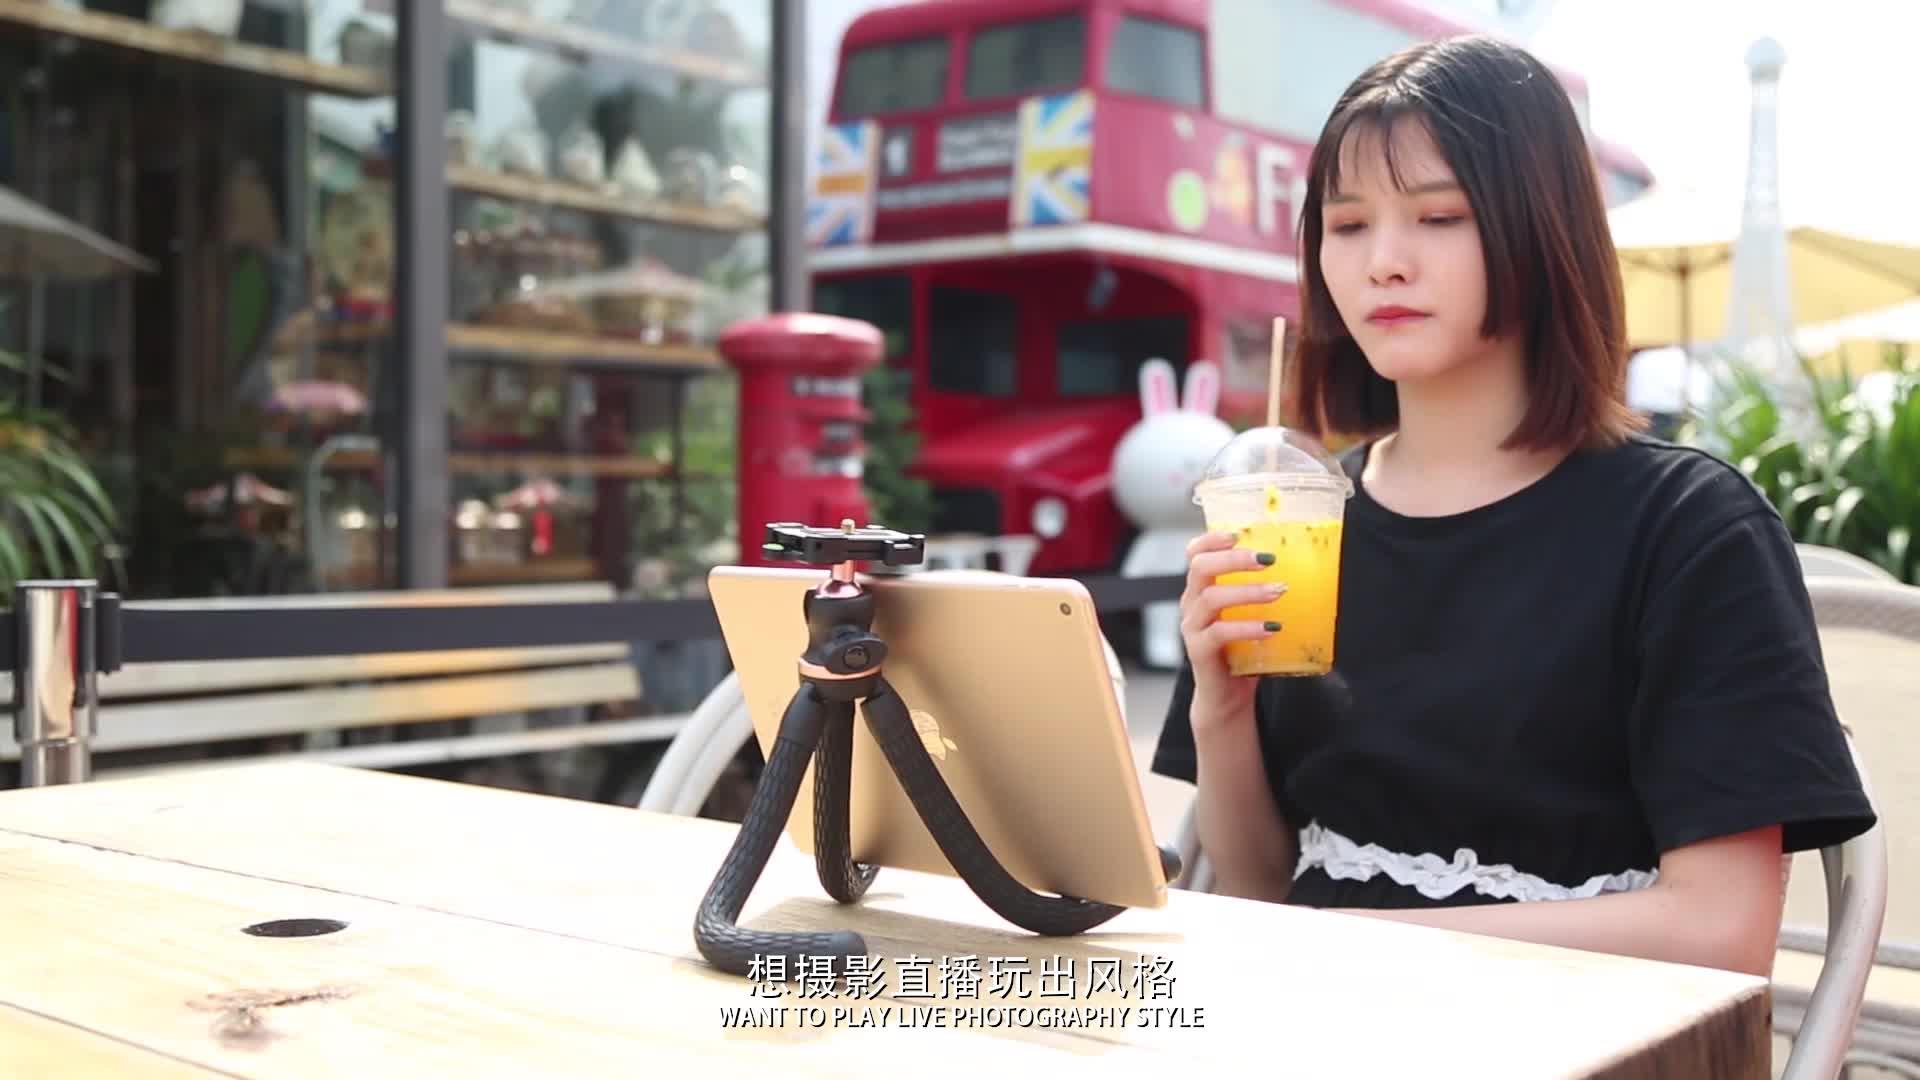 Flexible Camera Tripod Vlogging Bendable Travel Portable Mini Tripods Stands for DSLR Camera Smartphone Cell Phone